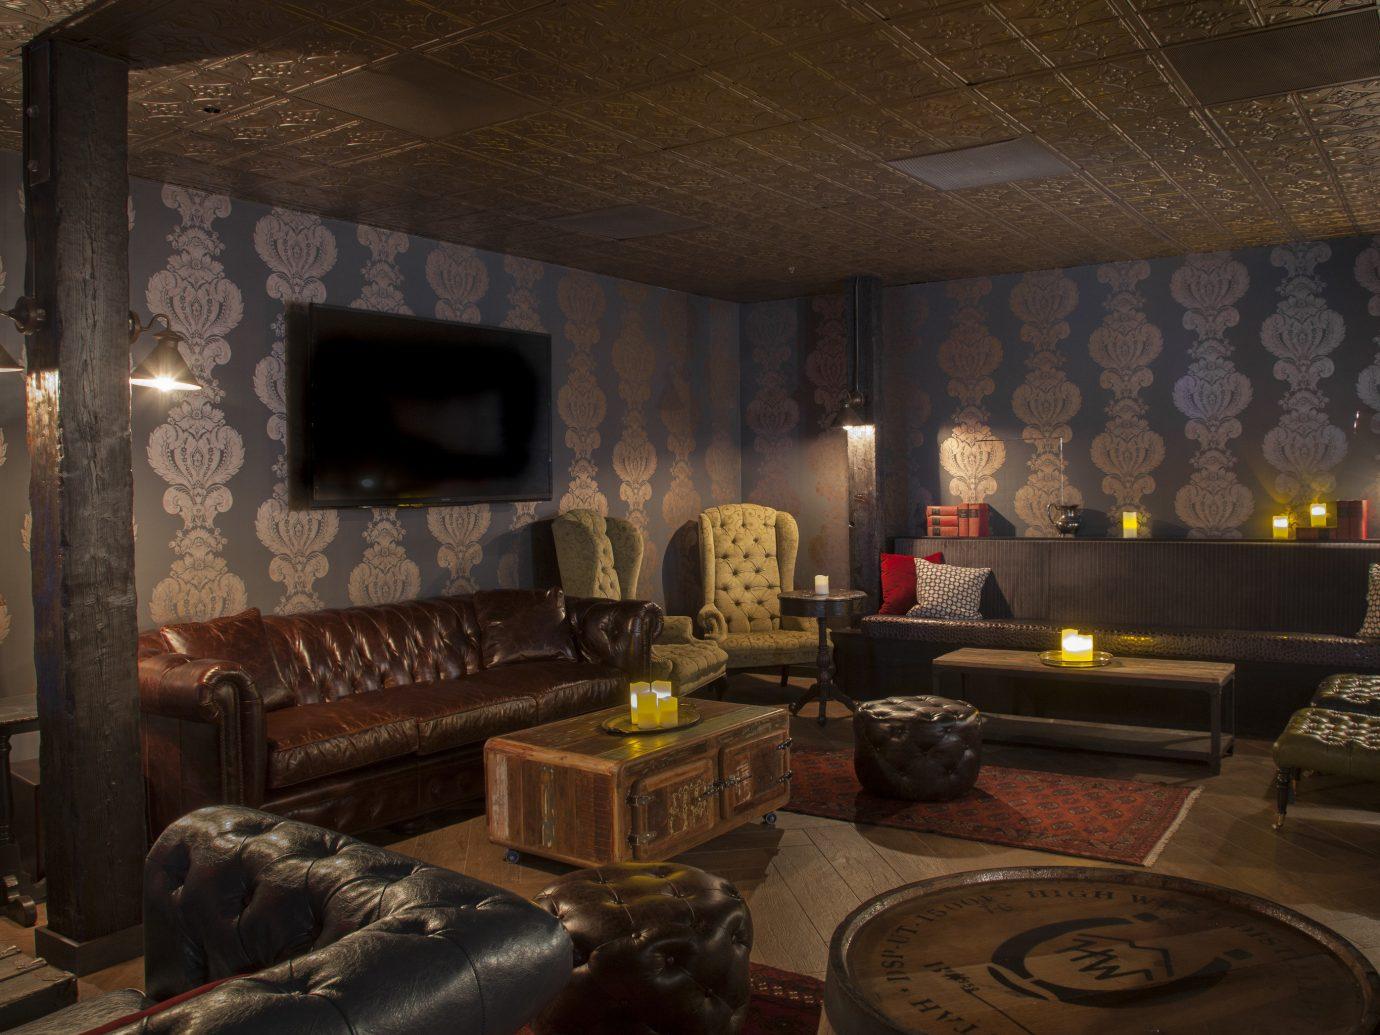 Mountains + Skiing Trip Ideas indoor room estate living room screenshot mansion interior design recreation room furniture